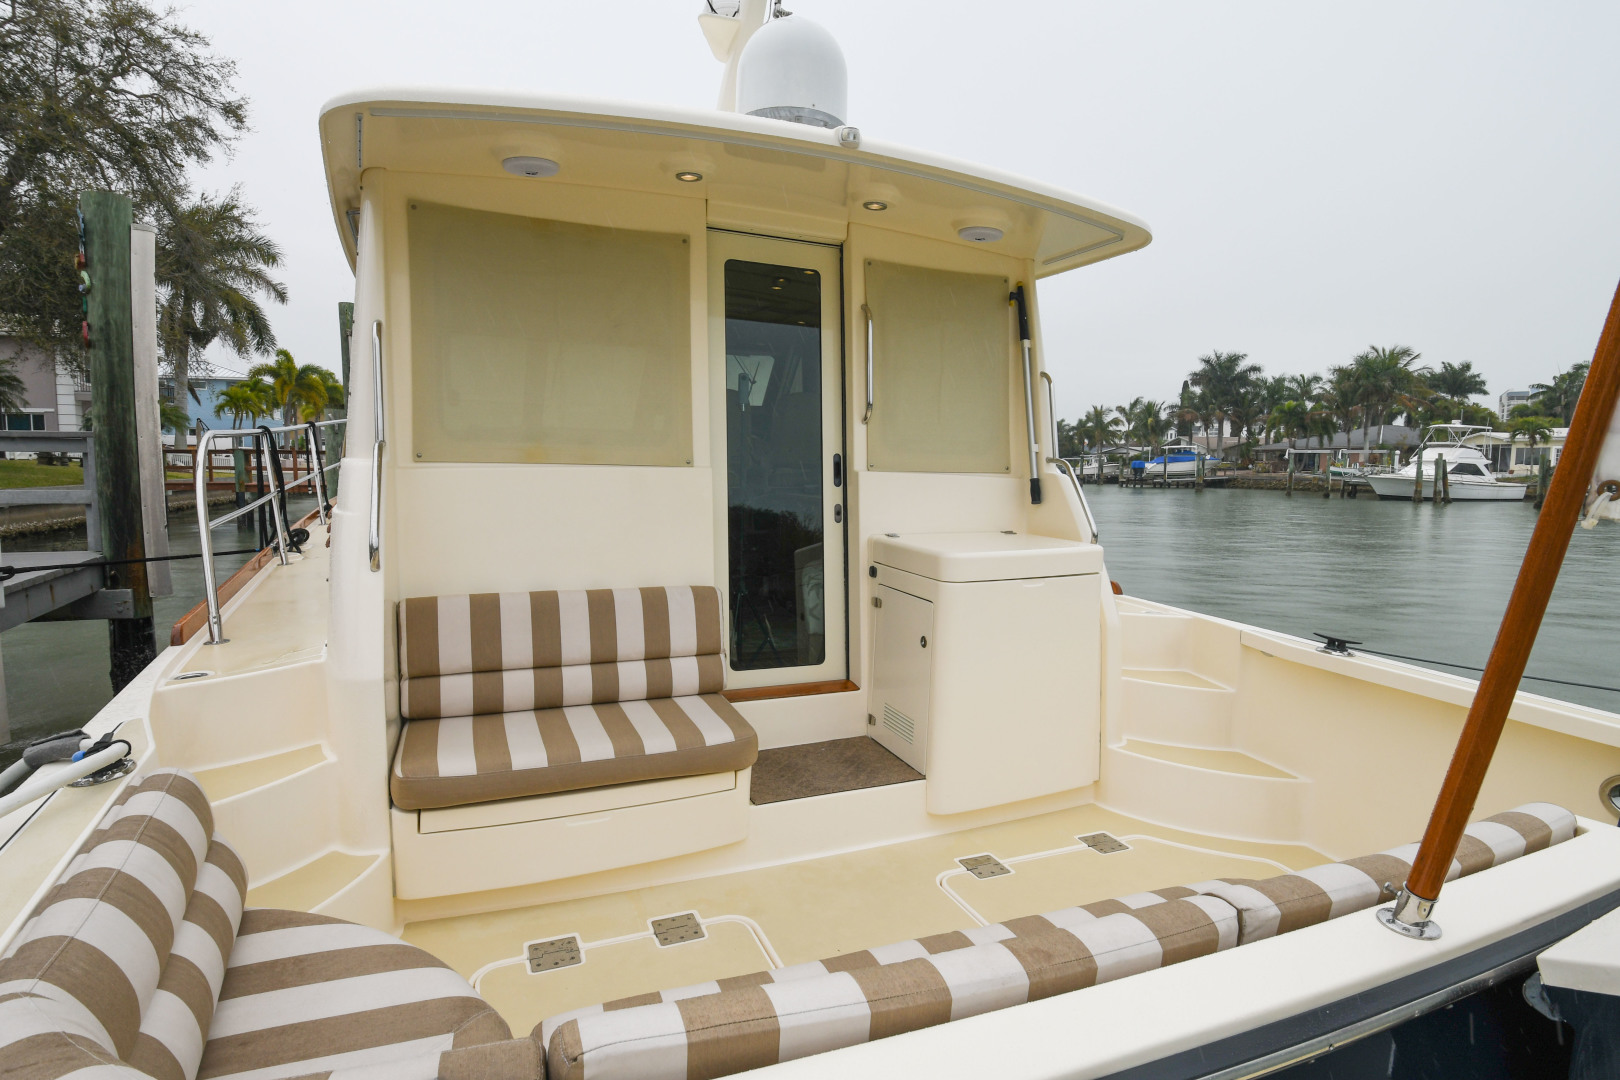 Sabre-40 Express 2010-Impulse Treasure Island-Florida-United States-2010 40 Sabre Express  Impulse  Cockpit-1618619 | Thumbnail